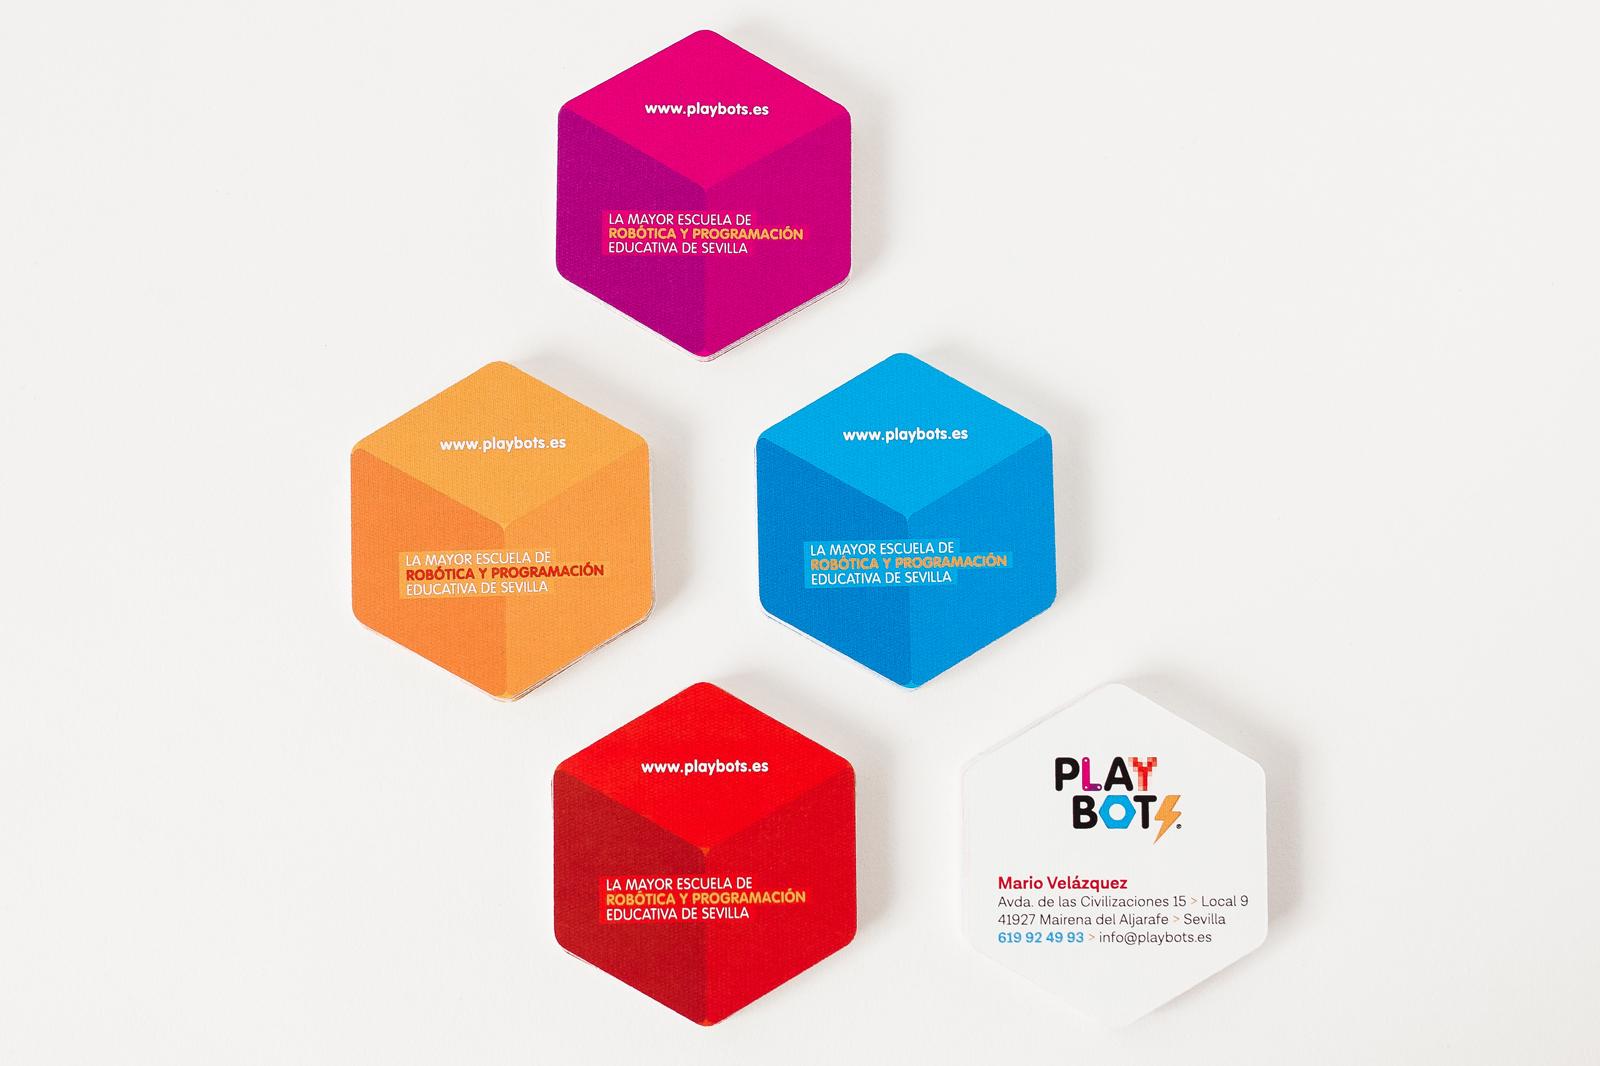 Pedro Cabañas - Design - PLAYBOTS